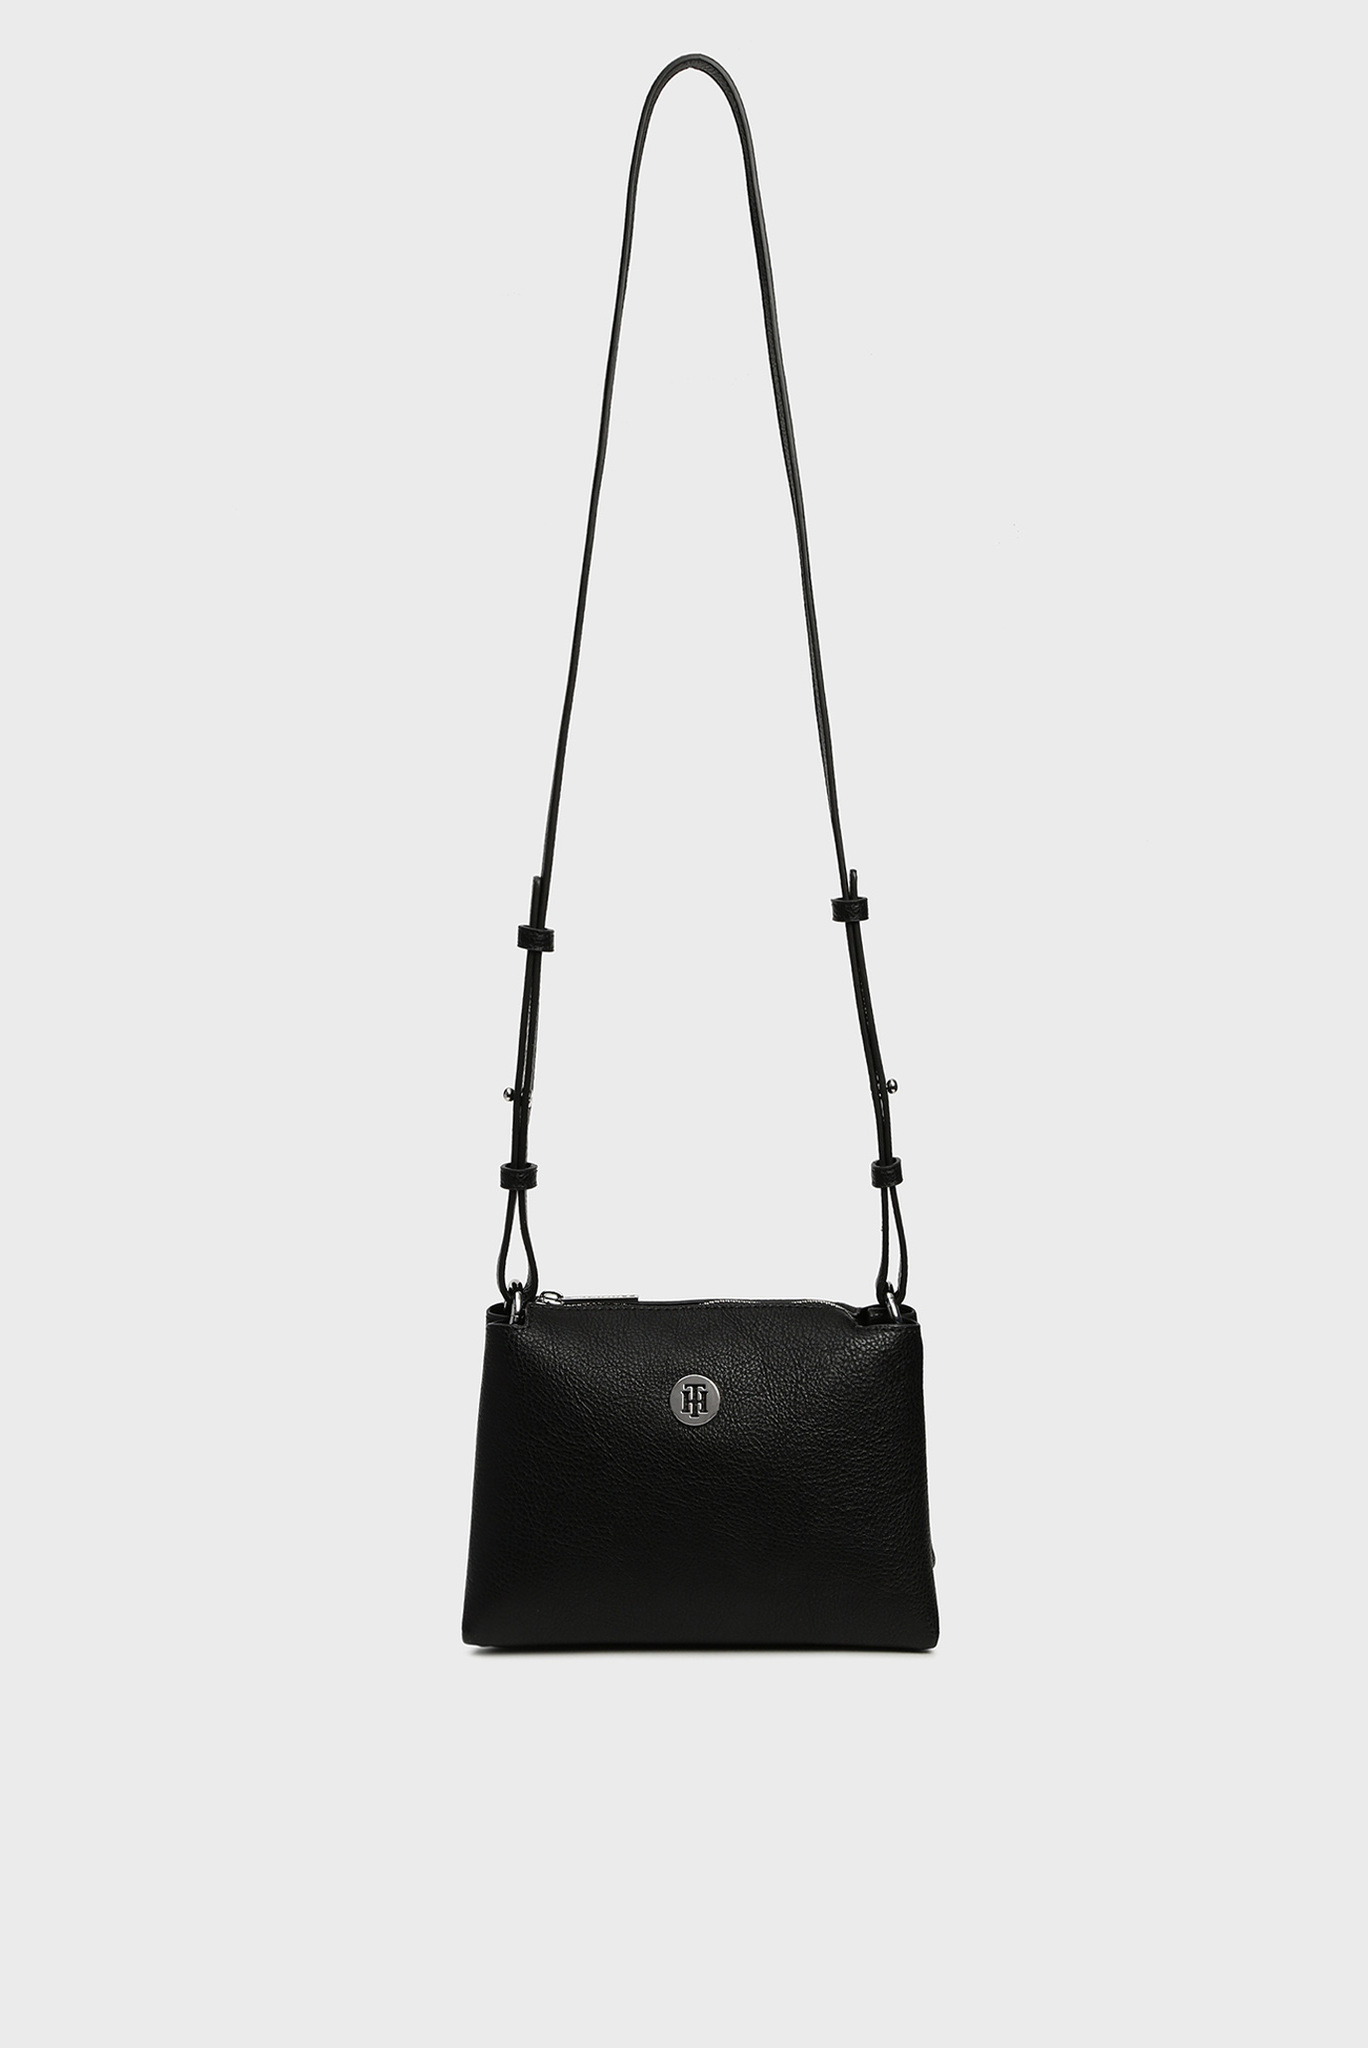 Женская черная сумка через плечо TH CORE Tommy Hilfiger